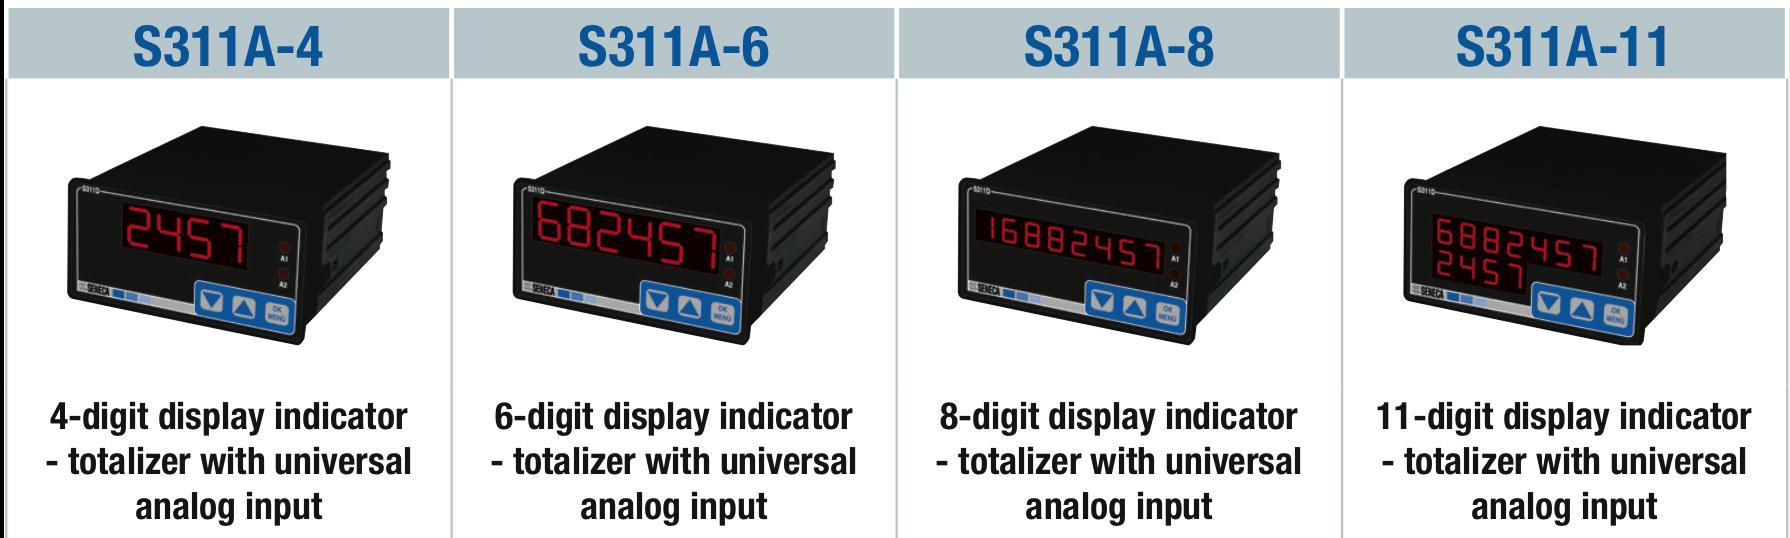 Bộ hiển thị S311A